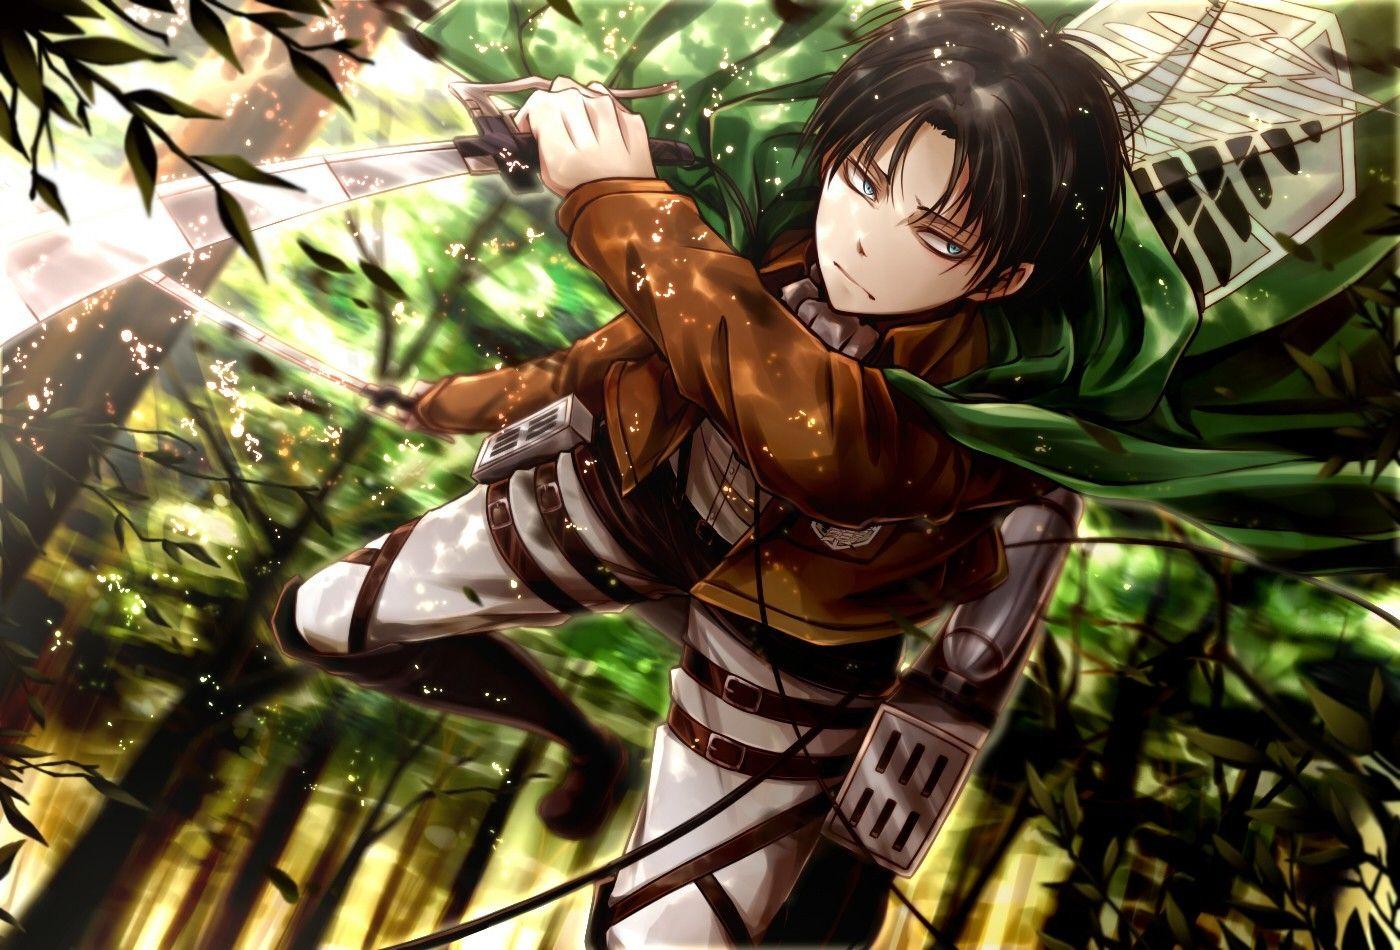 Anime Attack On Titan Levi Wallpaper Anime Wallpapers